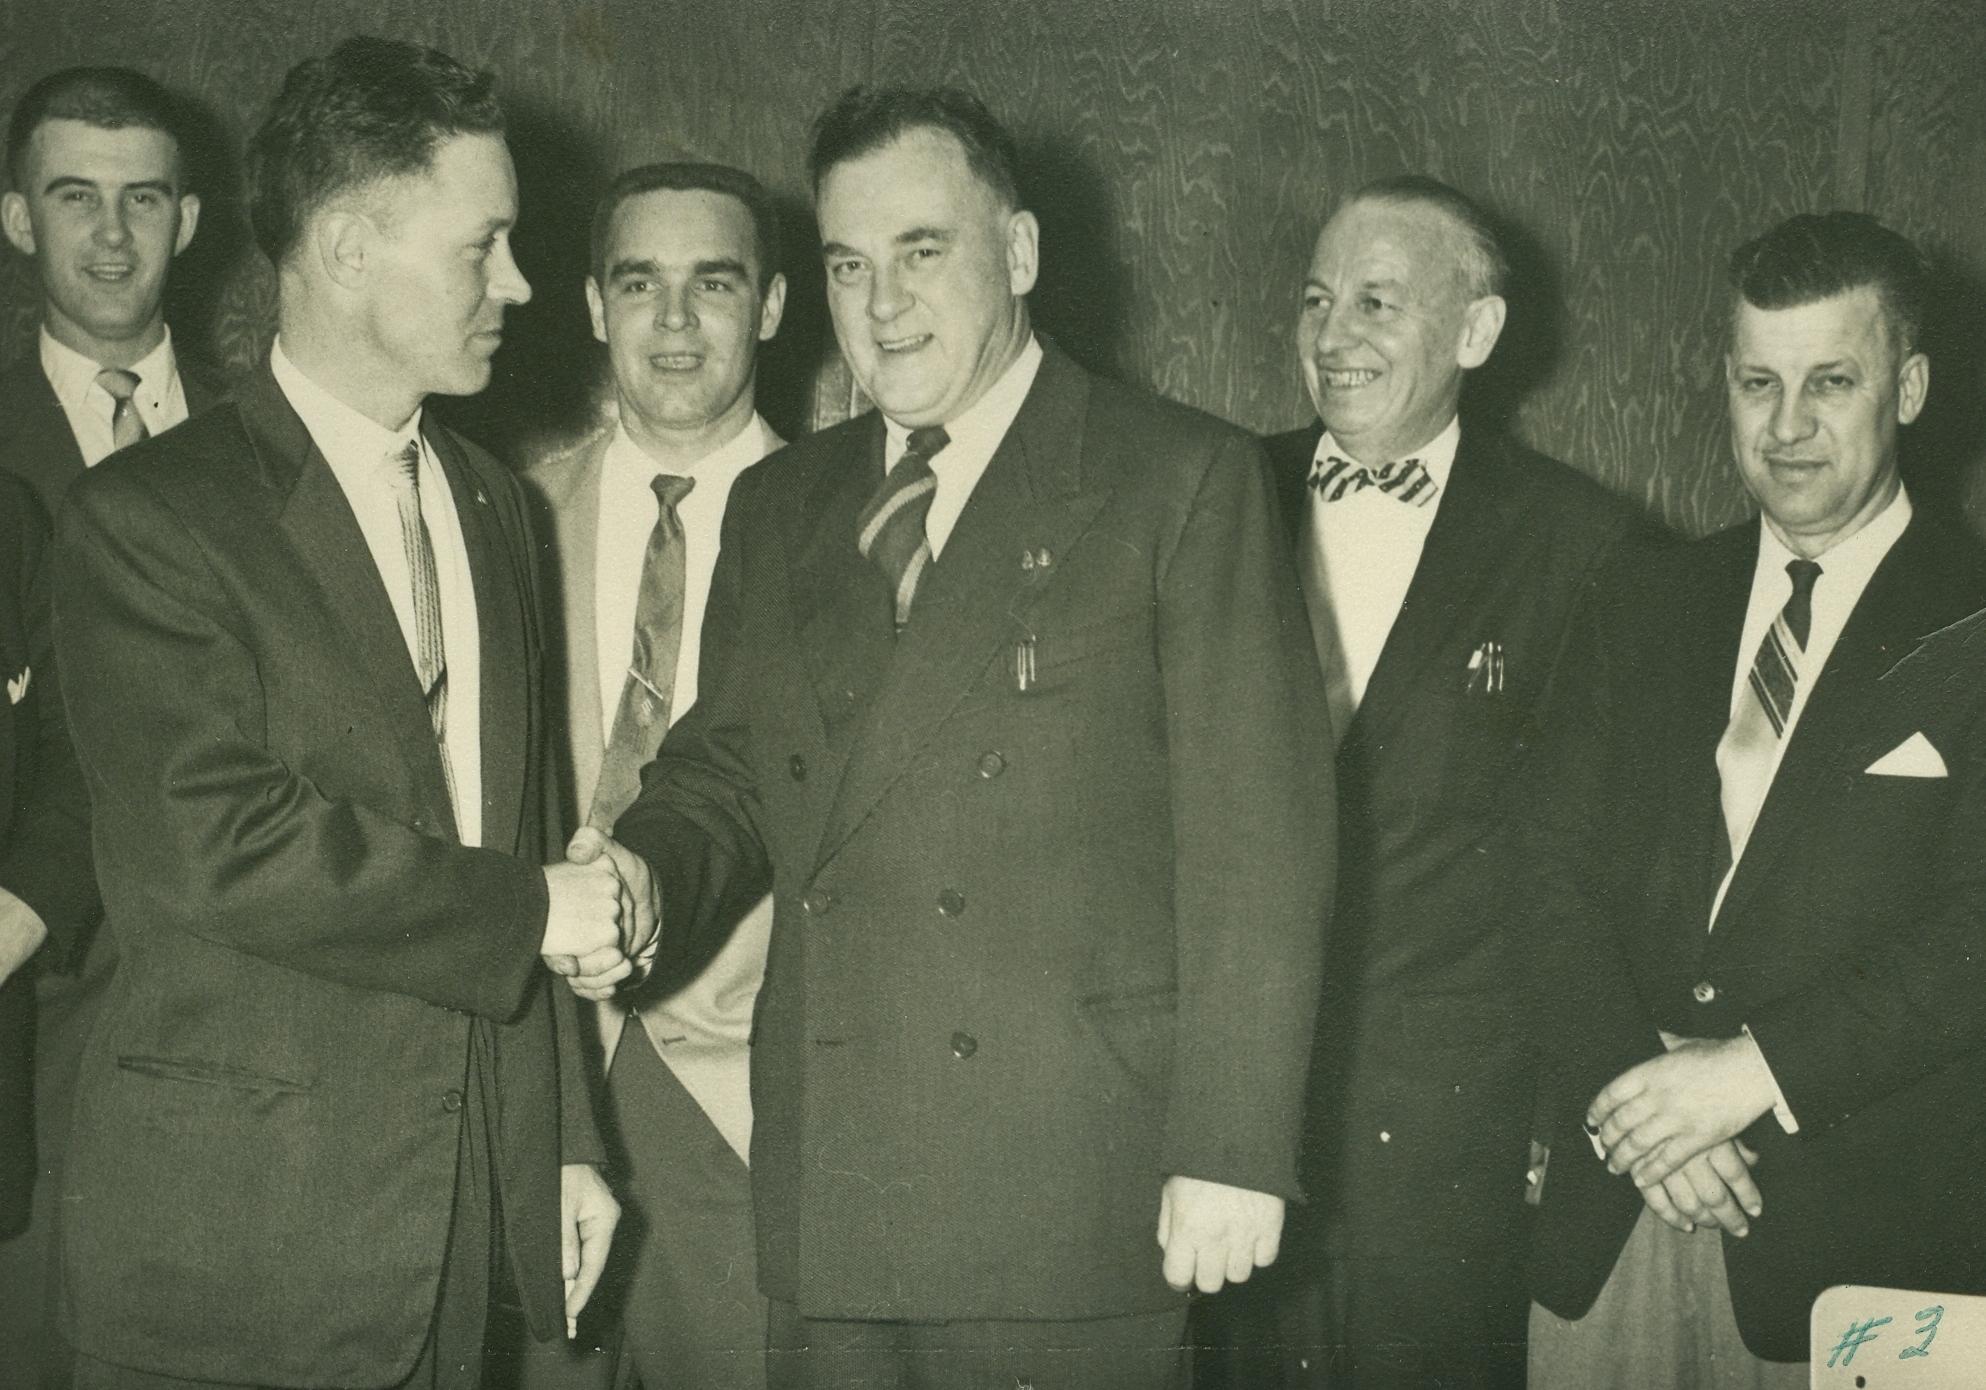 .Glen Derry; Maurice Fenton; George 'Buck' Mantle; Bill Monk; Bill MacDonald, George Osborne